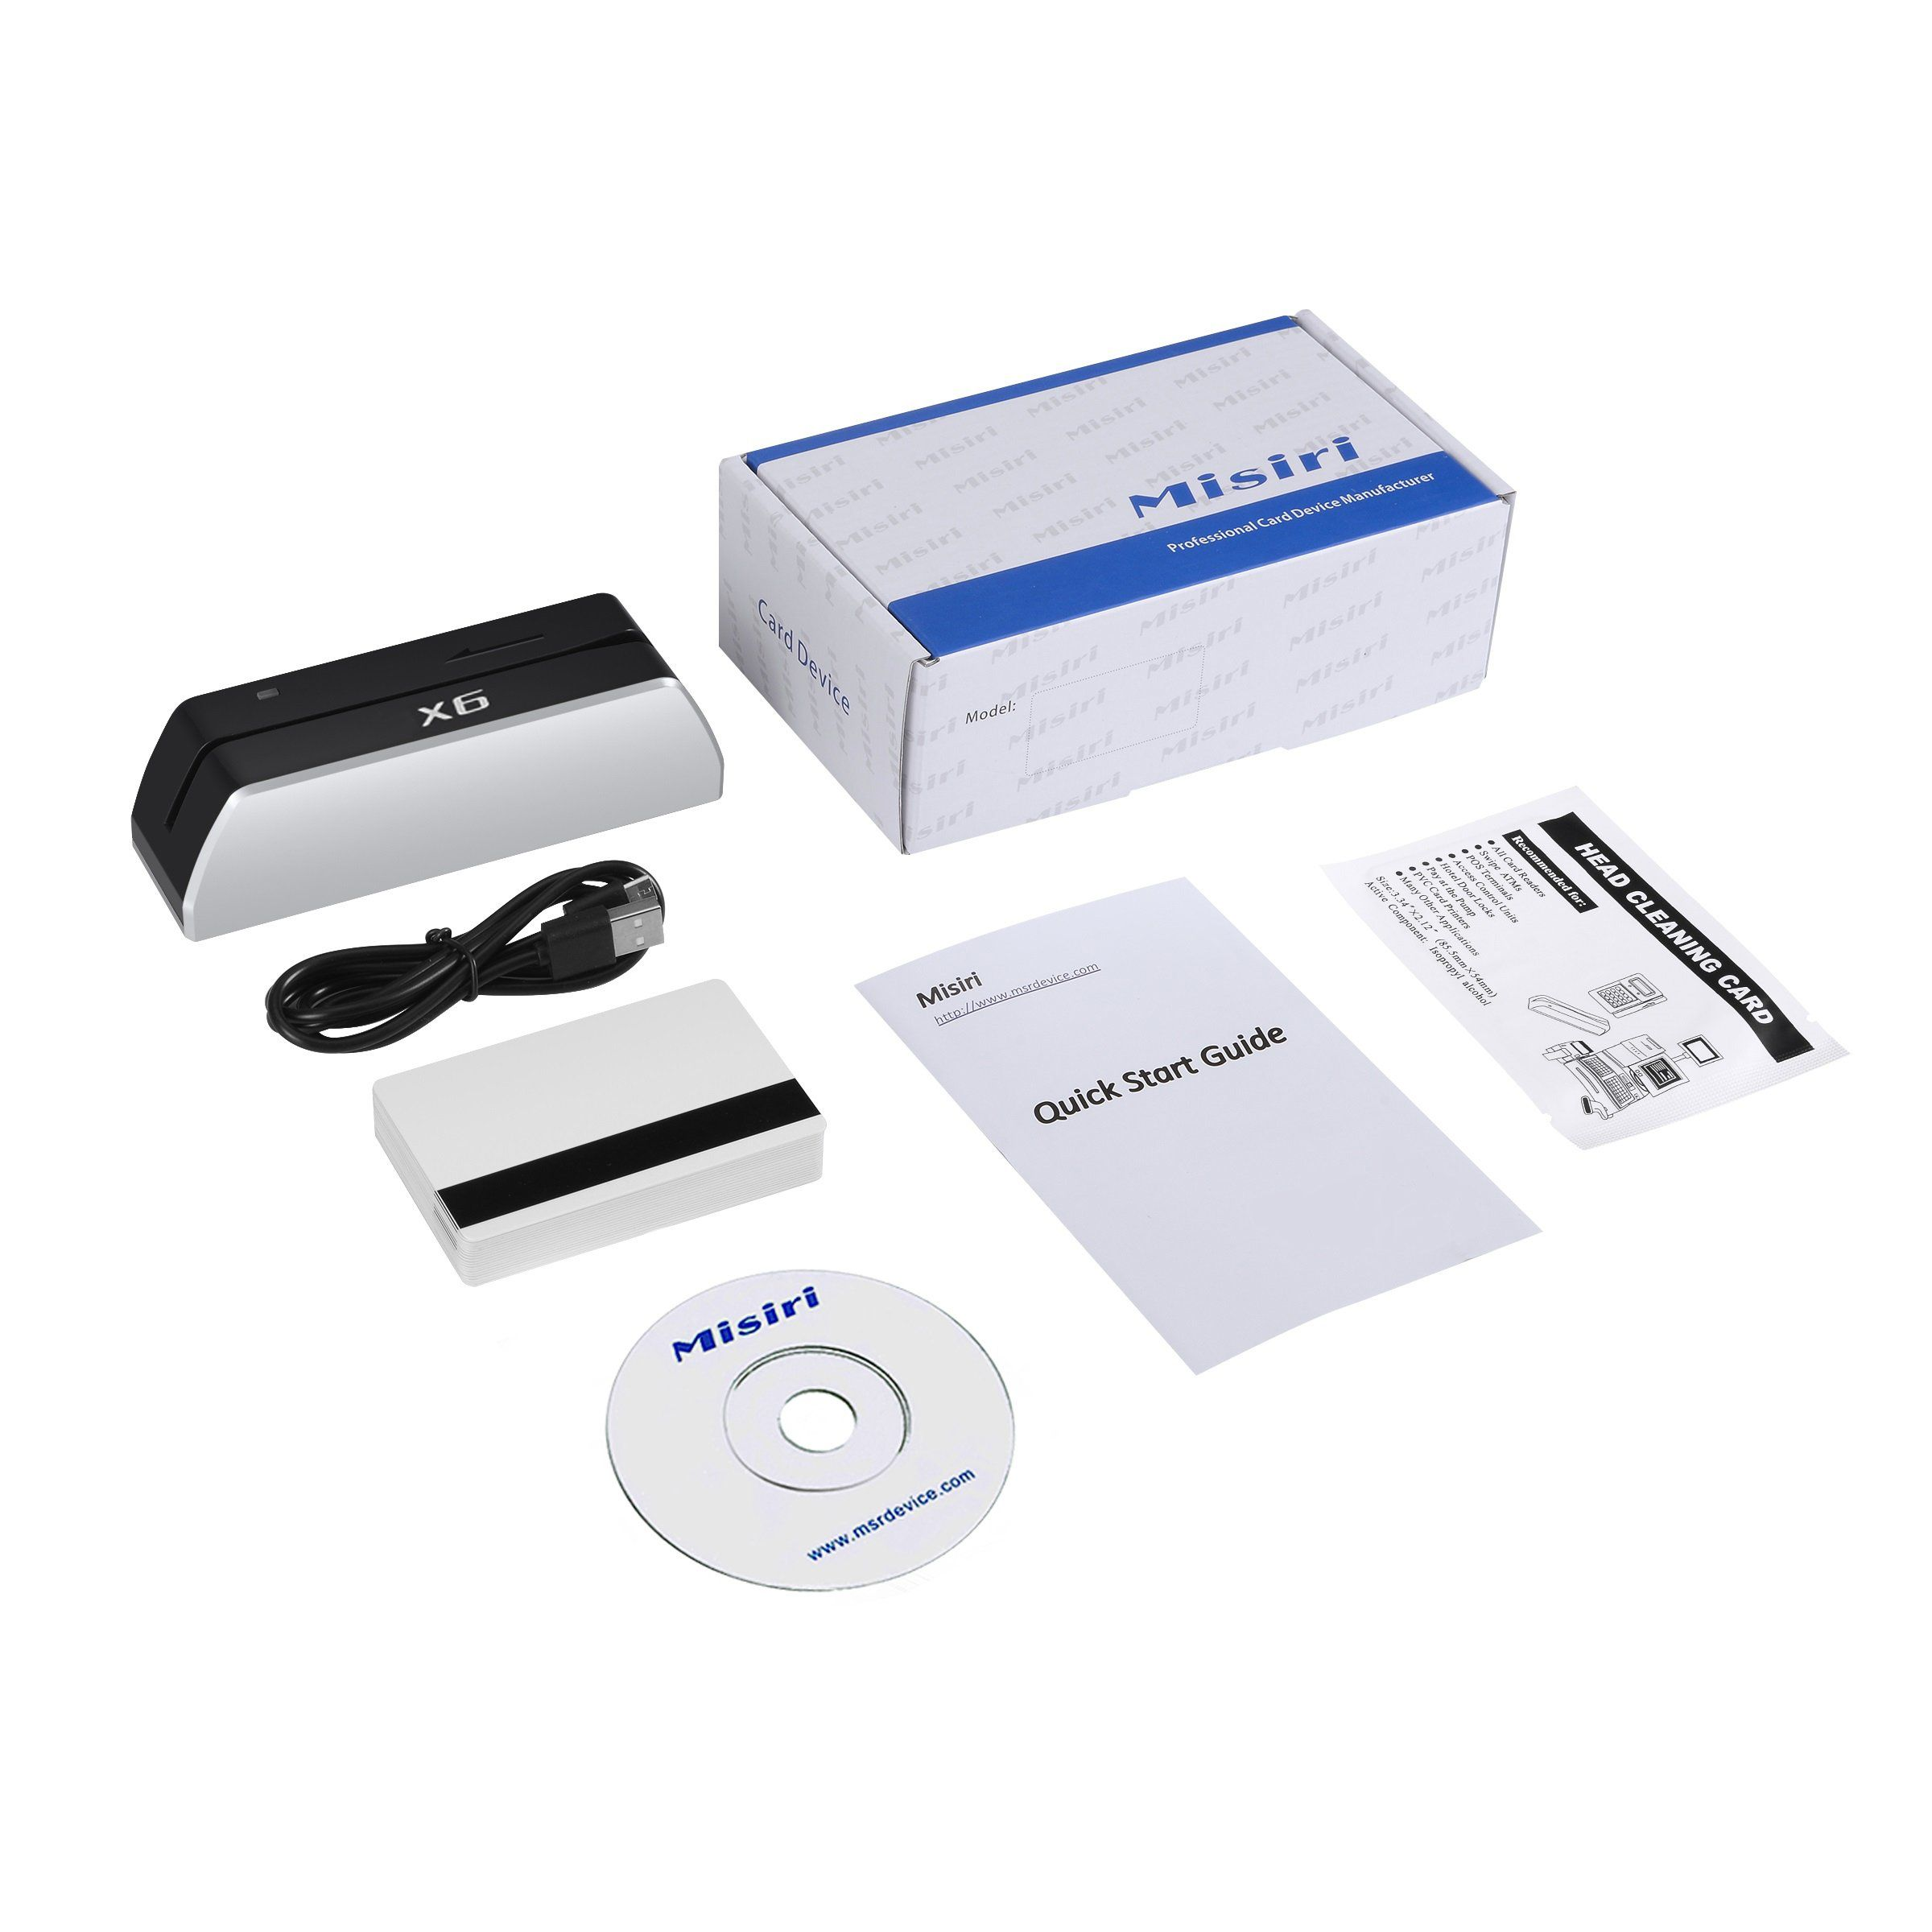 Misiri X6 Smallest Usb Magnetic Credit Card Reader Writer 1 4 Size Of 705 Credit Card Reader Writer Credit Card Readers Card Reader